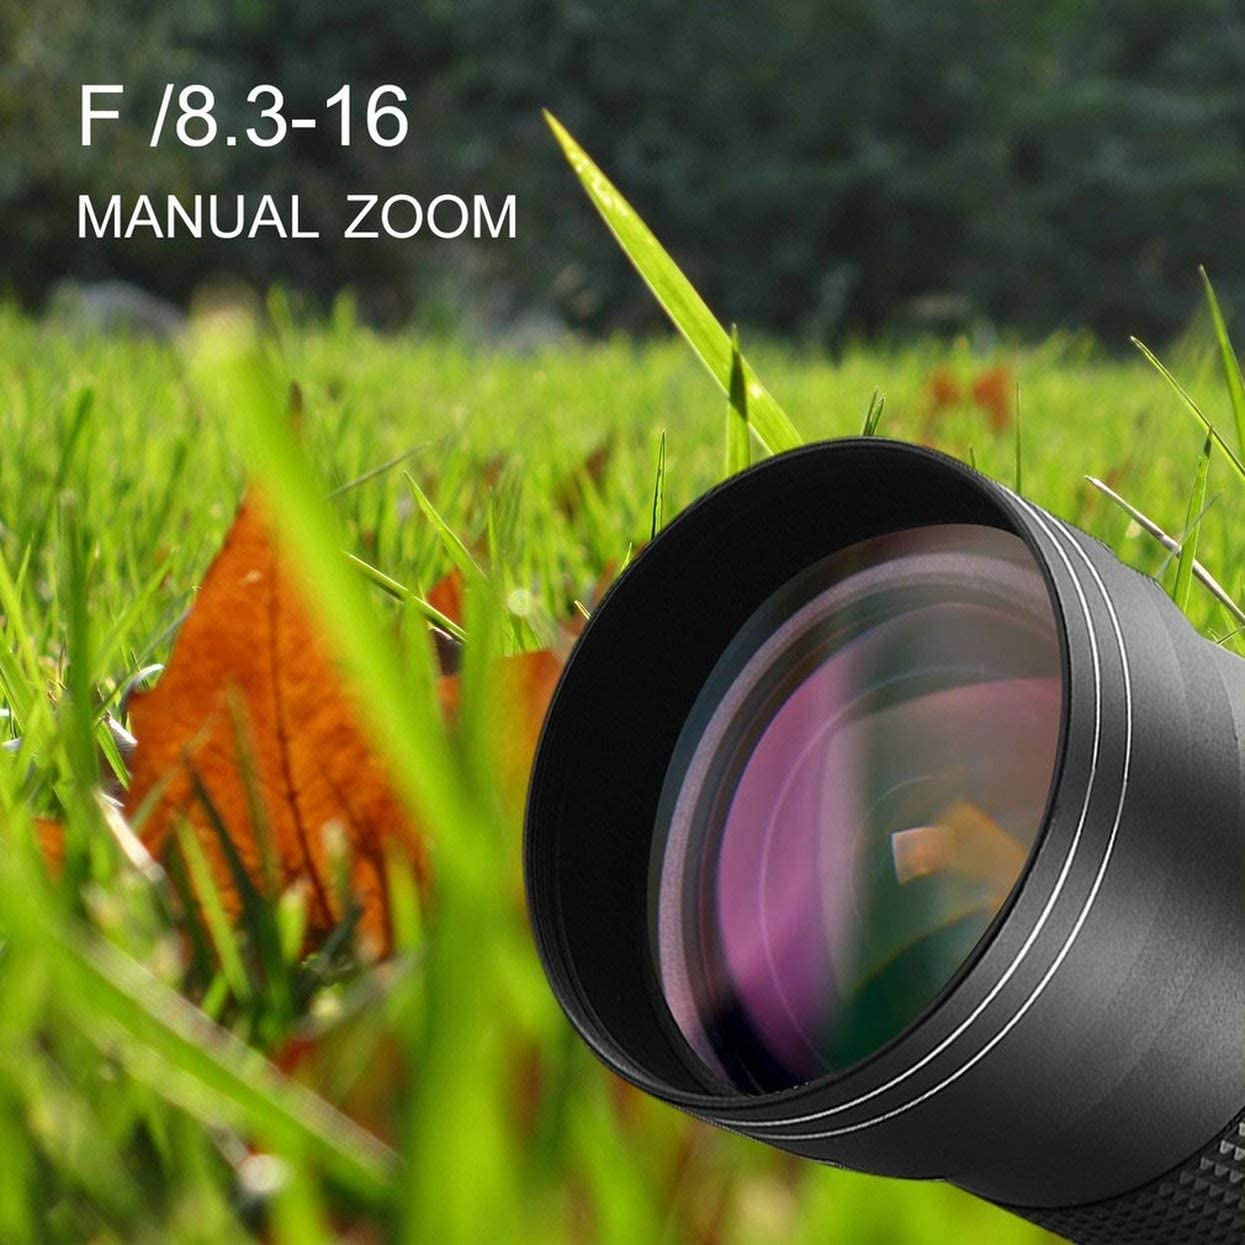 Detectorcatty 420-800mm f//8.3-16 Telephoto Lens for DSLR T Mount Camera D7200 D5300 D5200 D3300 D3200 D3000 D7100 D7000